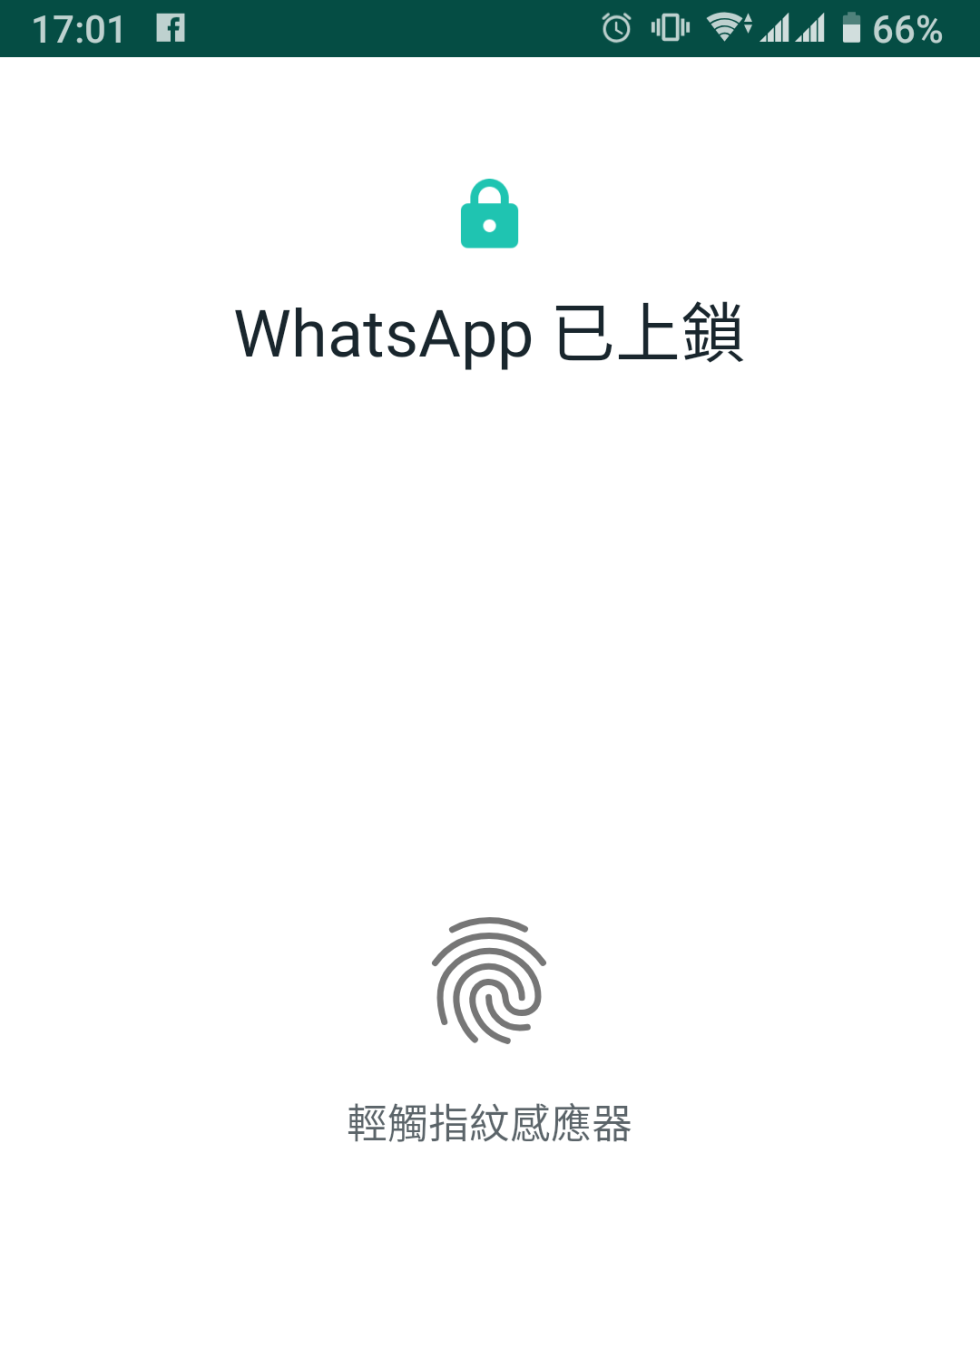 Whats App 軟體安全再升級,指紋辨識加持訊息保護更安心